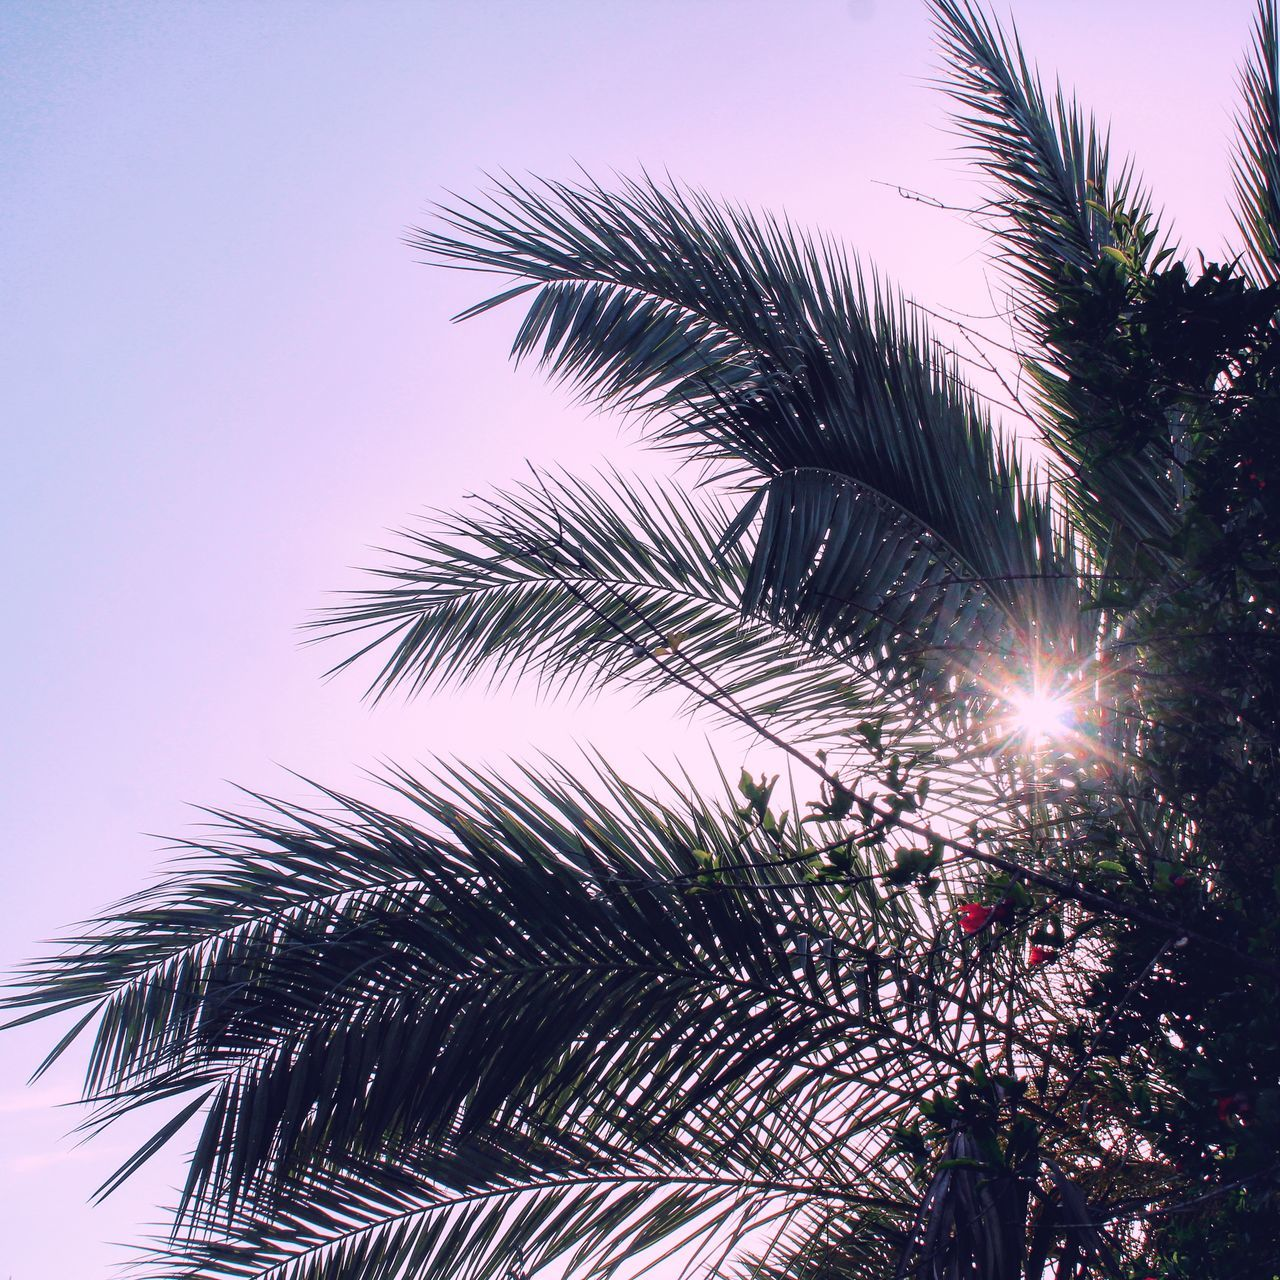 Popular Photos Popular Life EyeEm Palestine Follow Fresh On Eyeem  Nature_collection Eyeem Collection Landscspe Sunrise Sunset Follow #f4f #followme #TagsForLikes #TFLers #followforfollow #follow4follow #teamfollowback #followher #followbackteam #followh Sunshine Like Followme Nature Photography